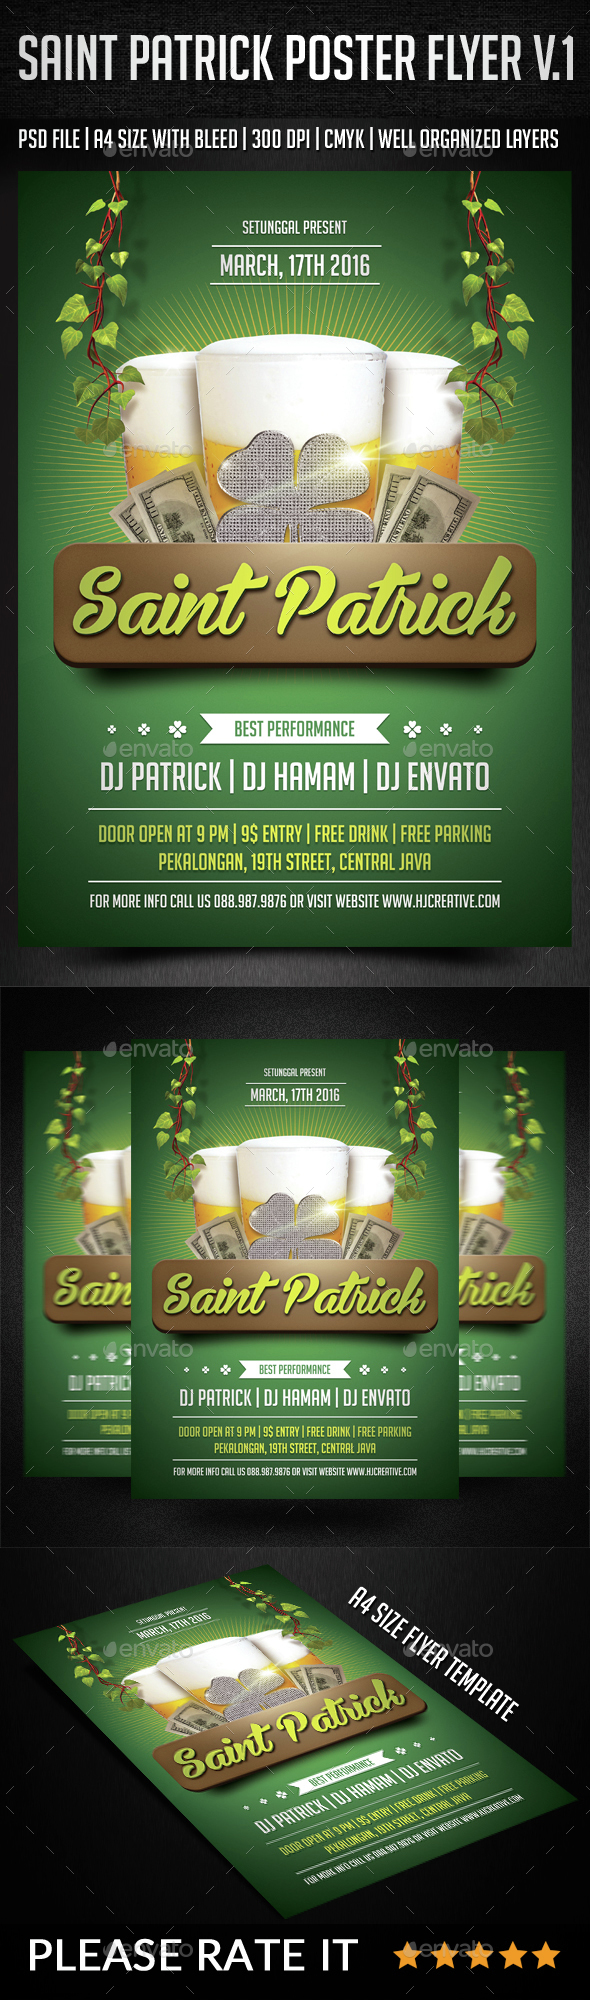 Saint Patrick Poster Flyer Vol. 1 - Clubs & Parties Events